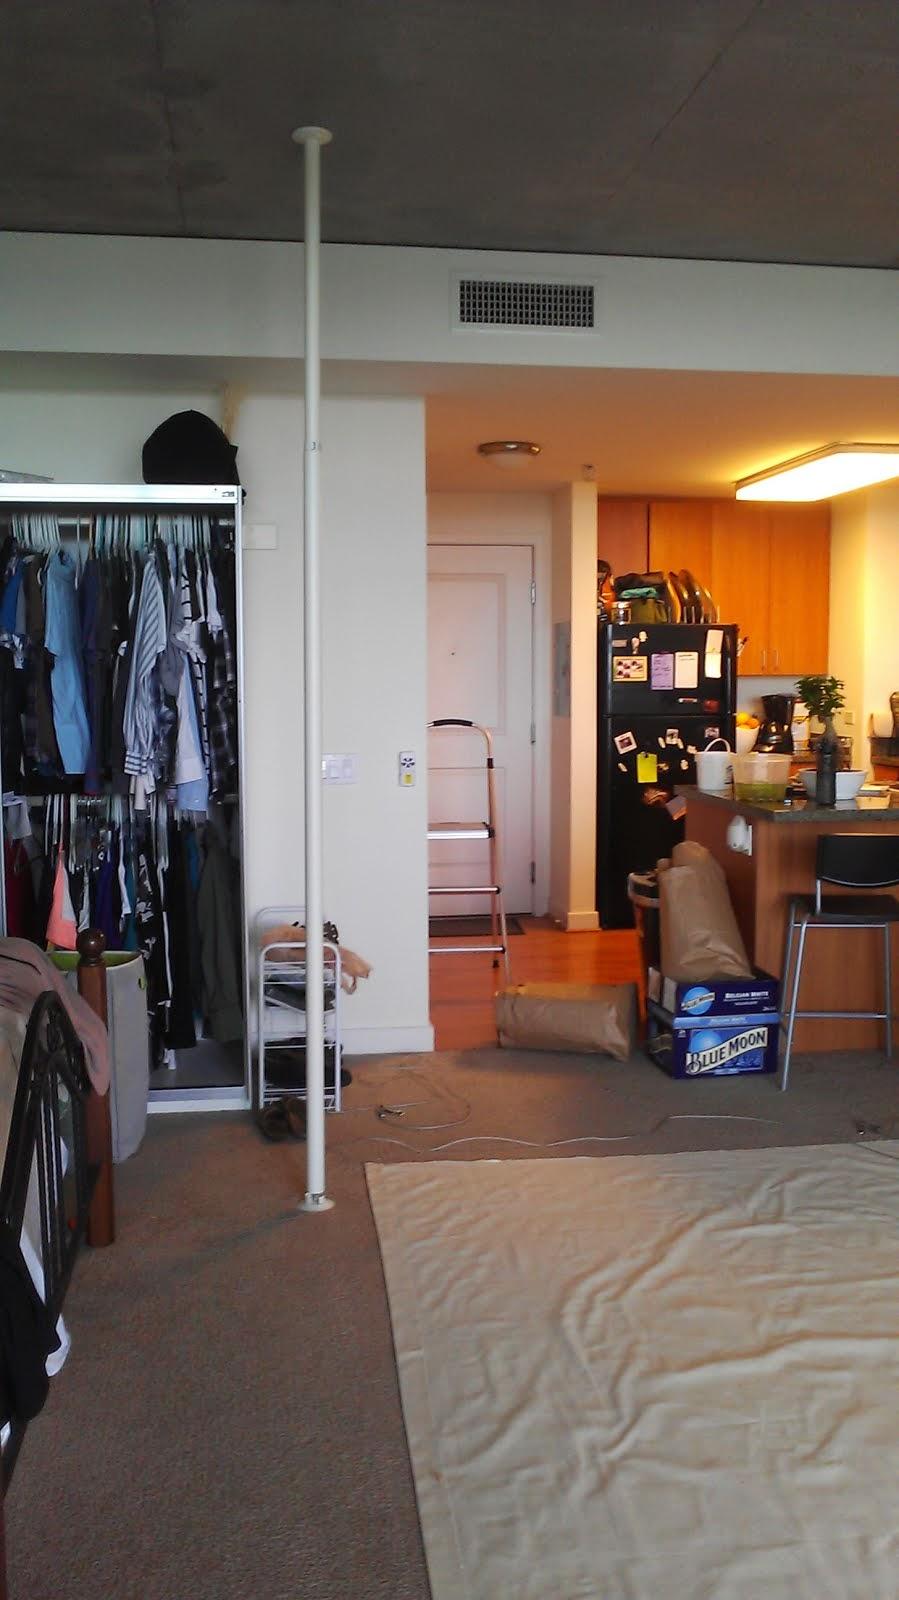 stolmen room divider ikea hackers ikea hackers. Black Bedroom Furniture Sets. Home Design Ideas